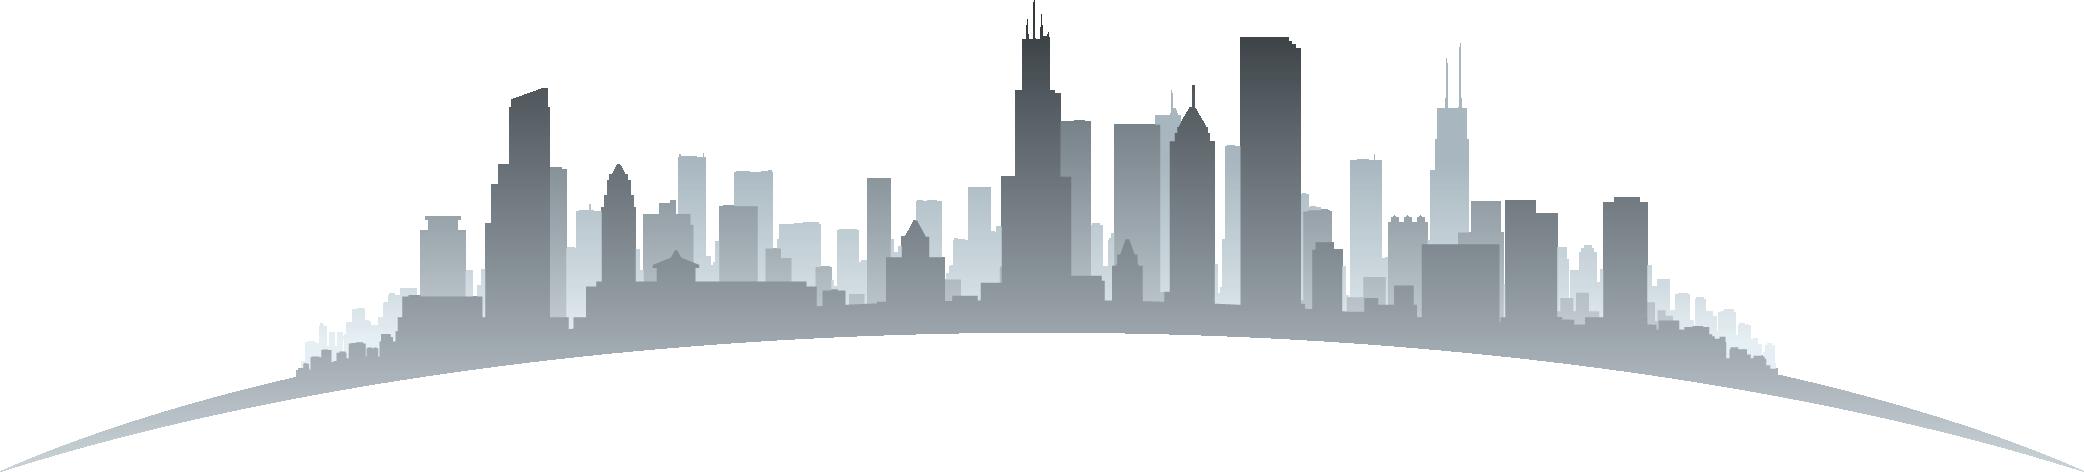 Test America - Chicago, Illinois